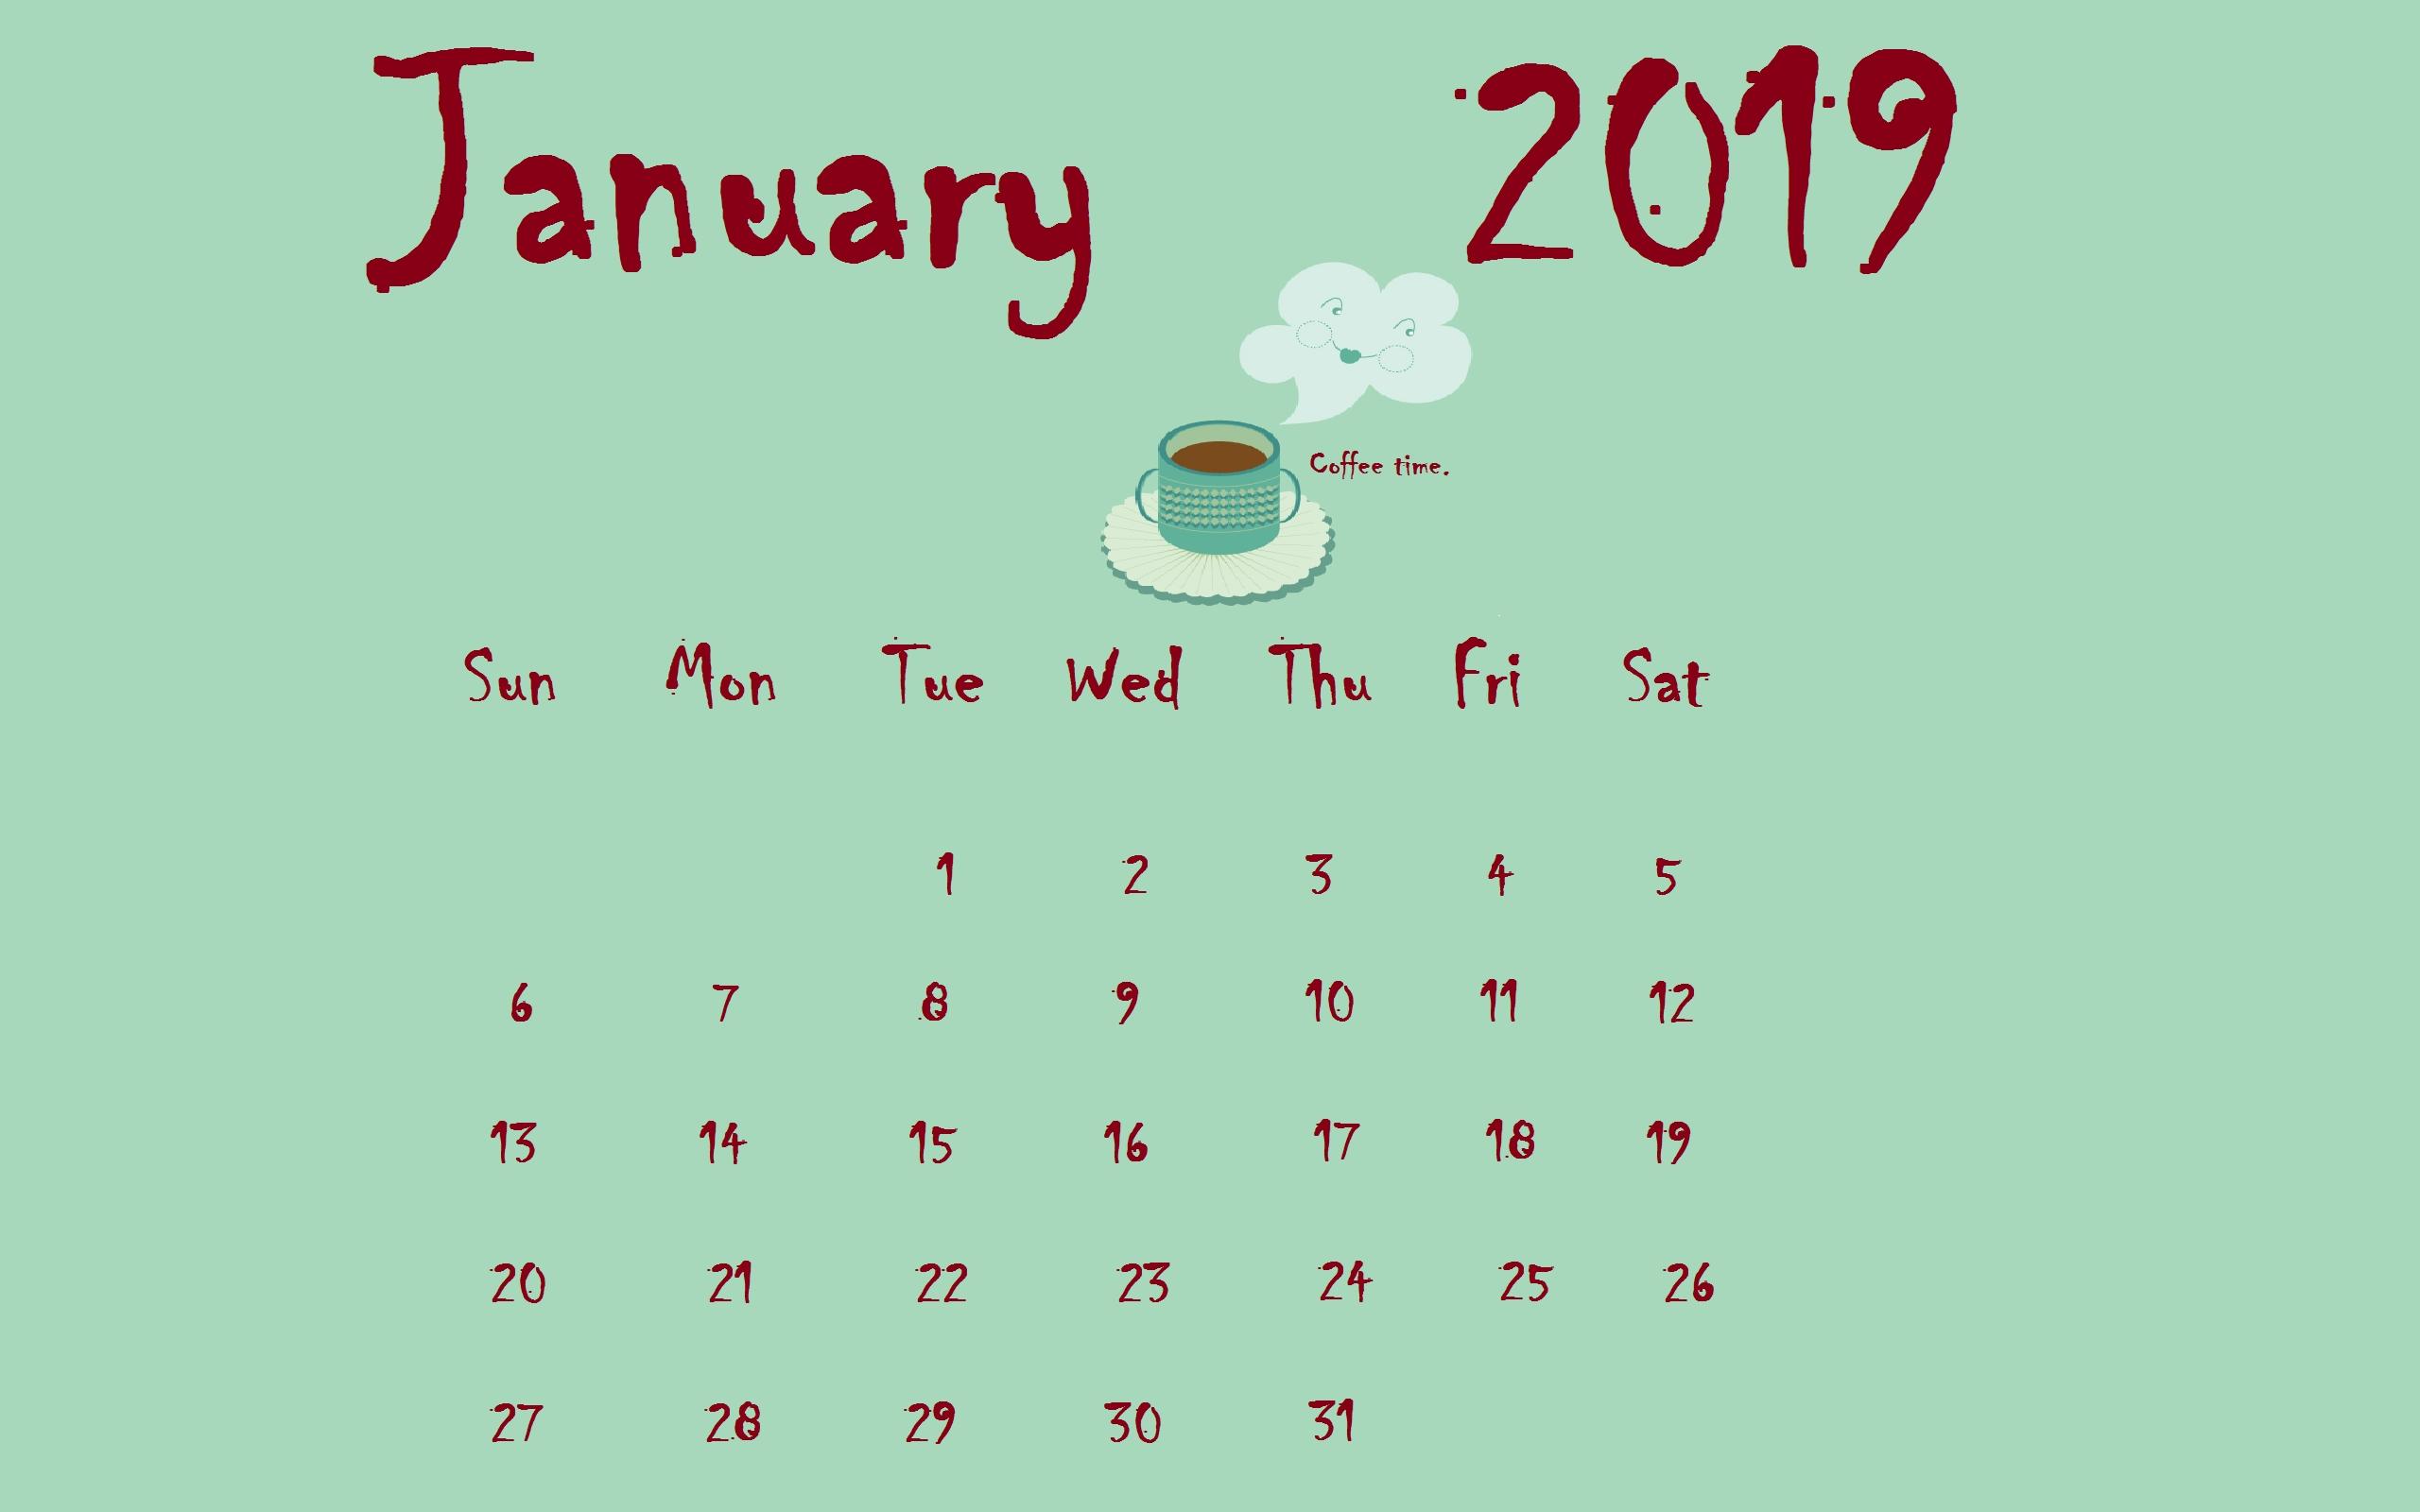 Download January 2019 Desktop Calendar | Calendar Designs In 2019 Calendar 2019 Desktop